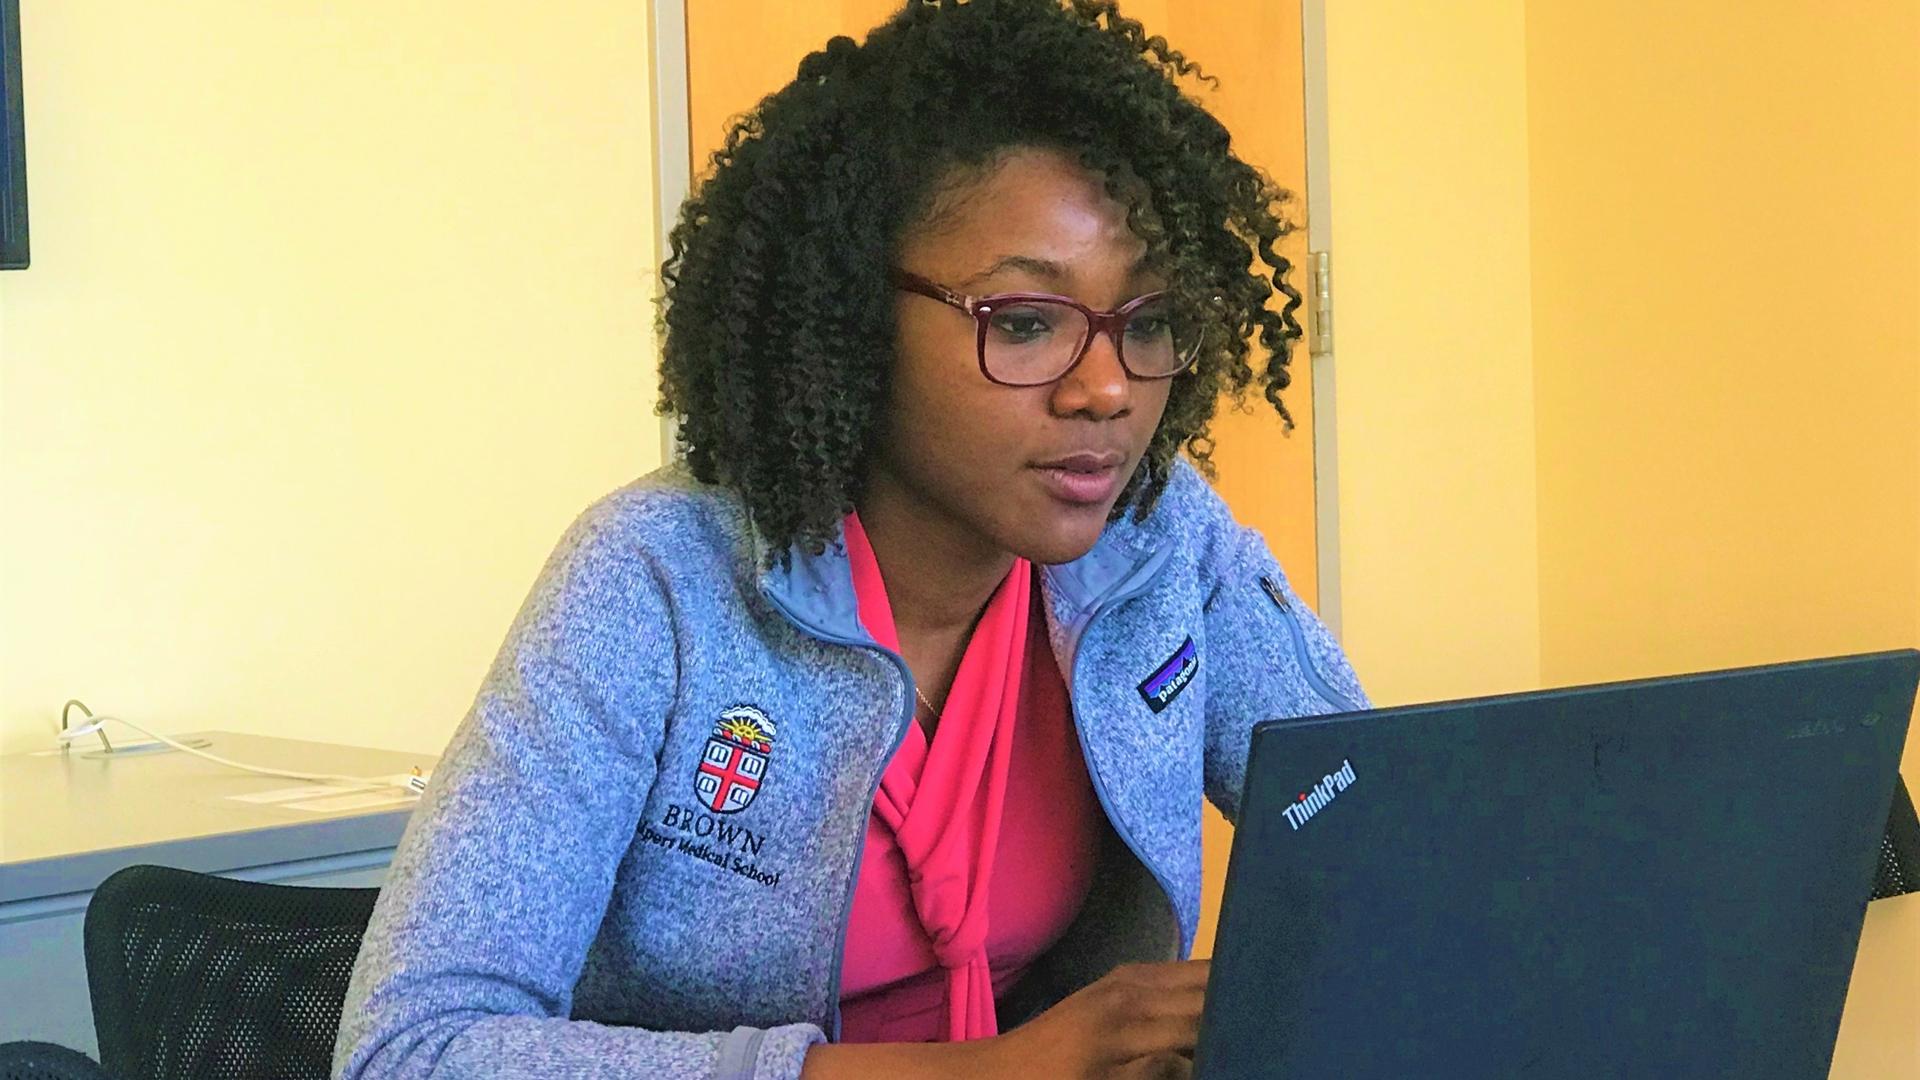 NewMediaWire | Racial disparities continue for black women